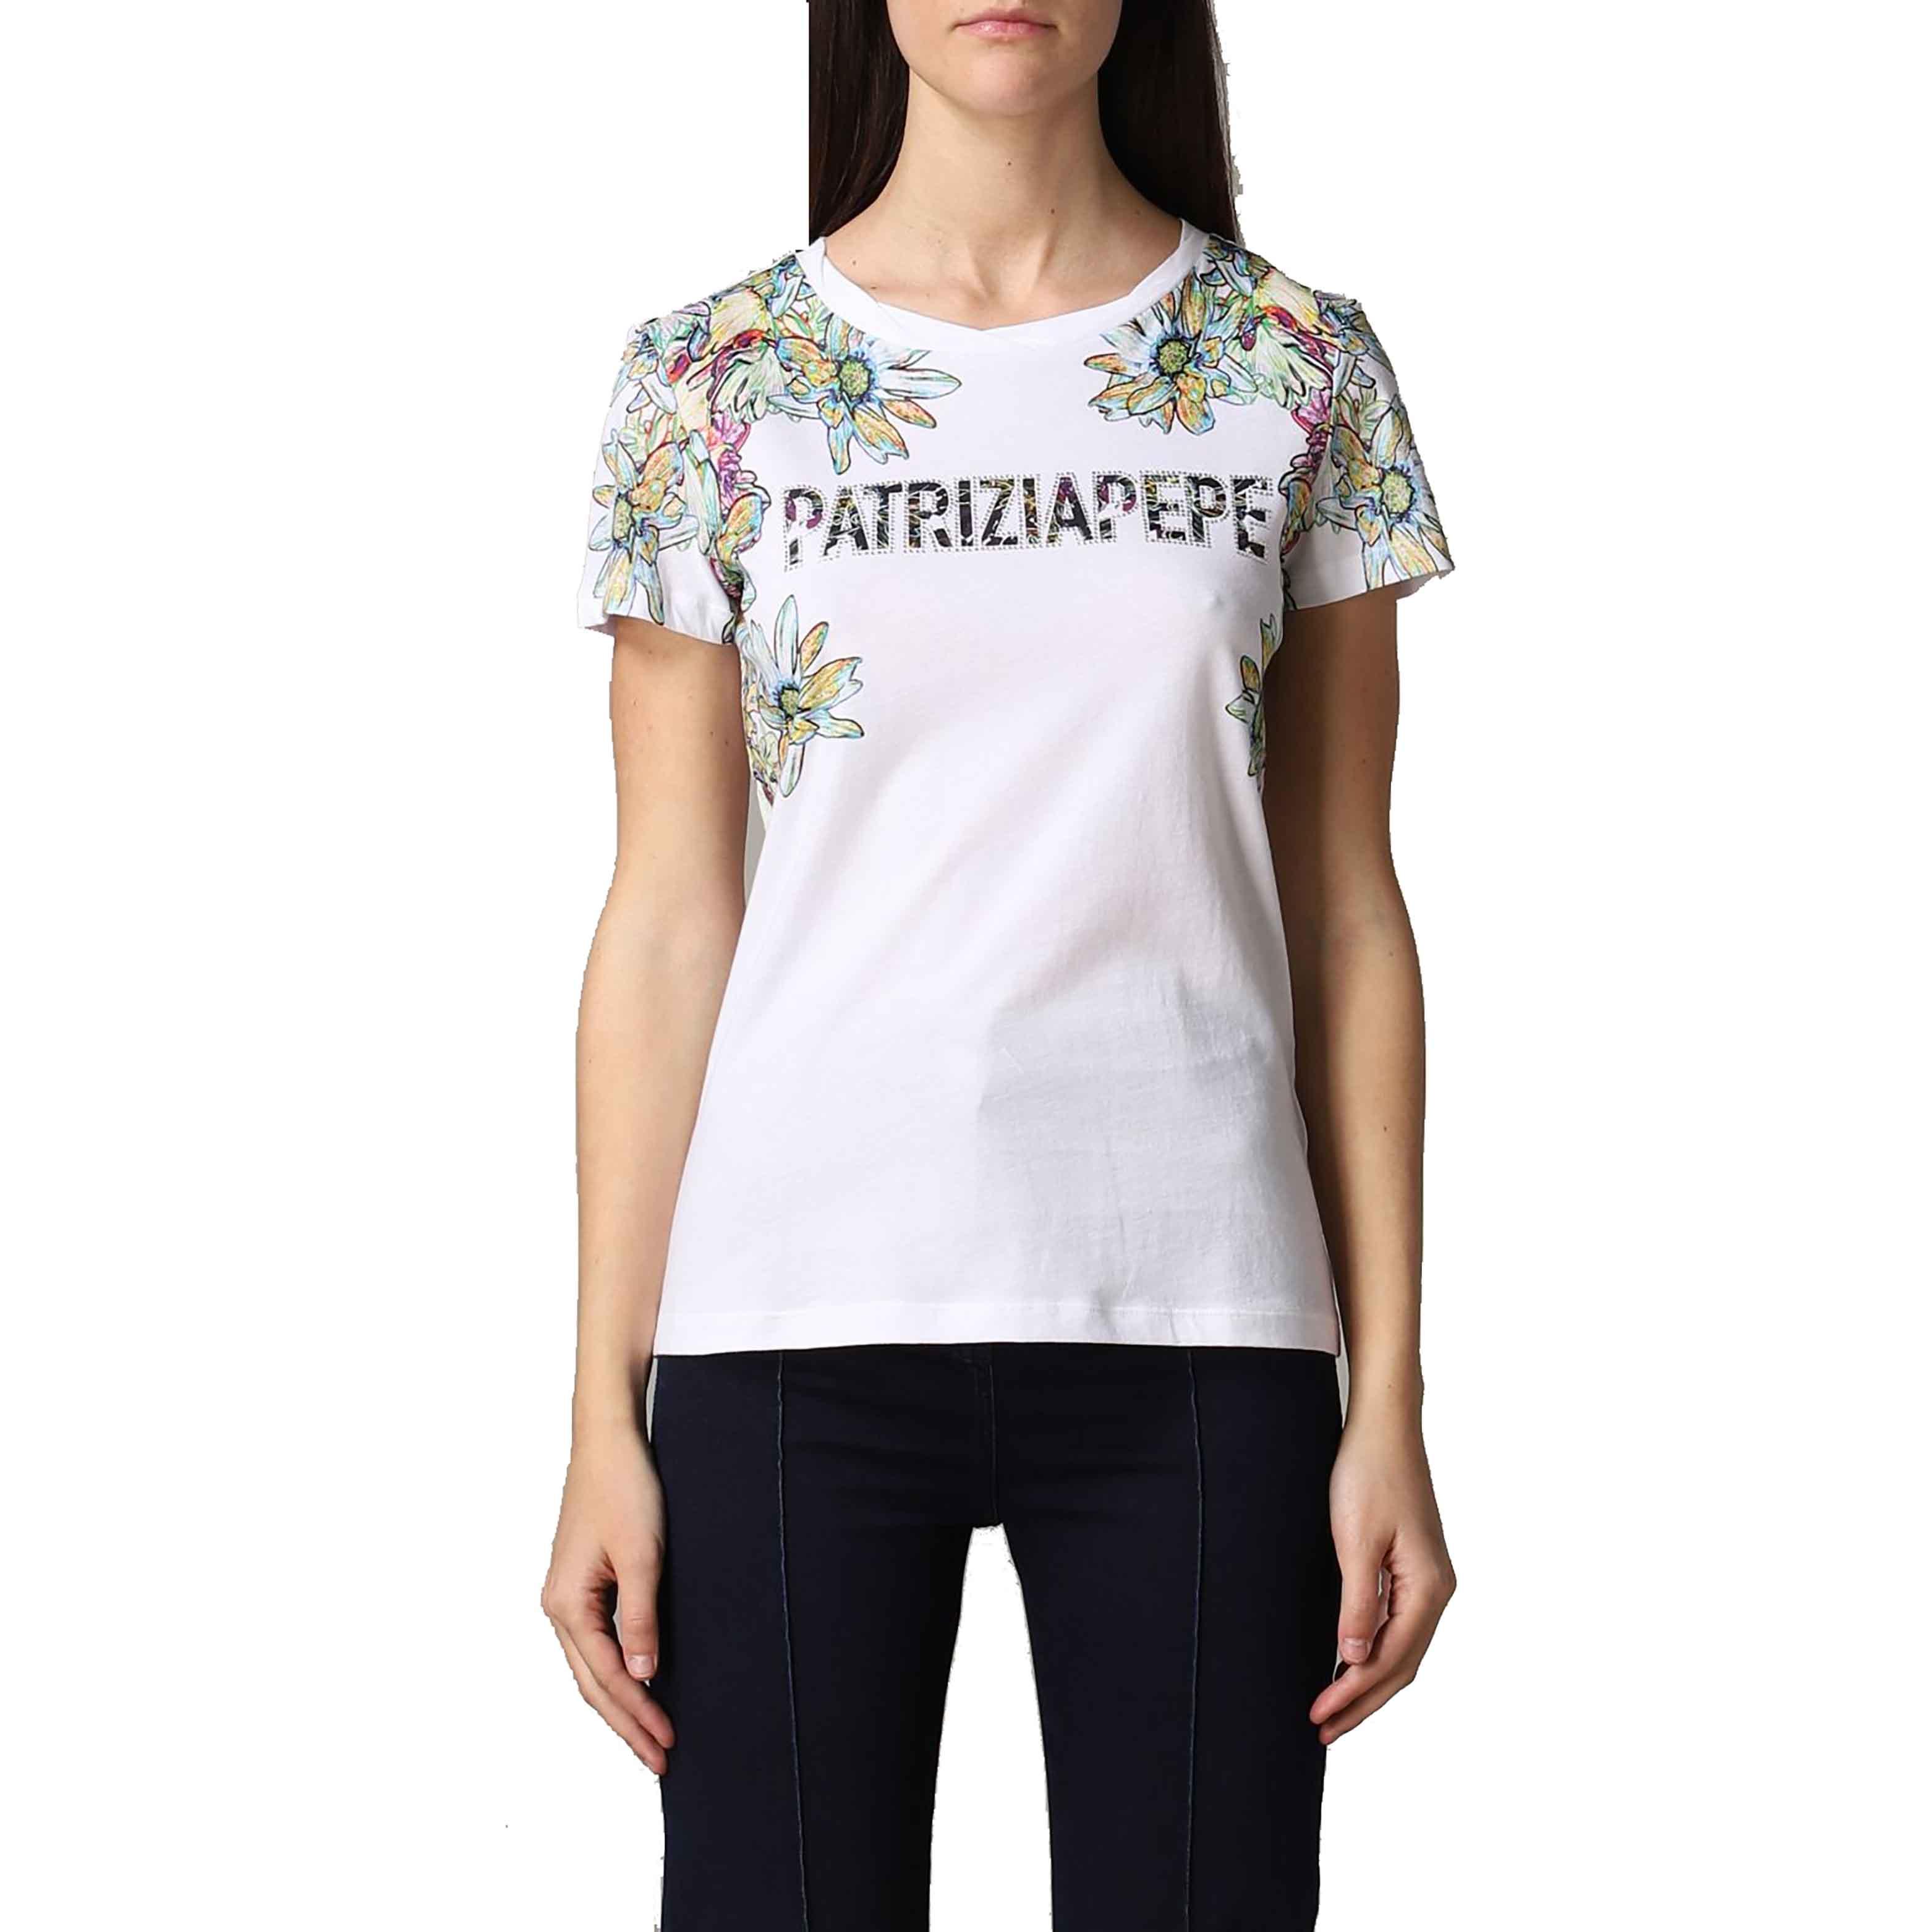 T shirt stampa fiori bianca - PATRIZIA PEPE